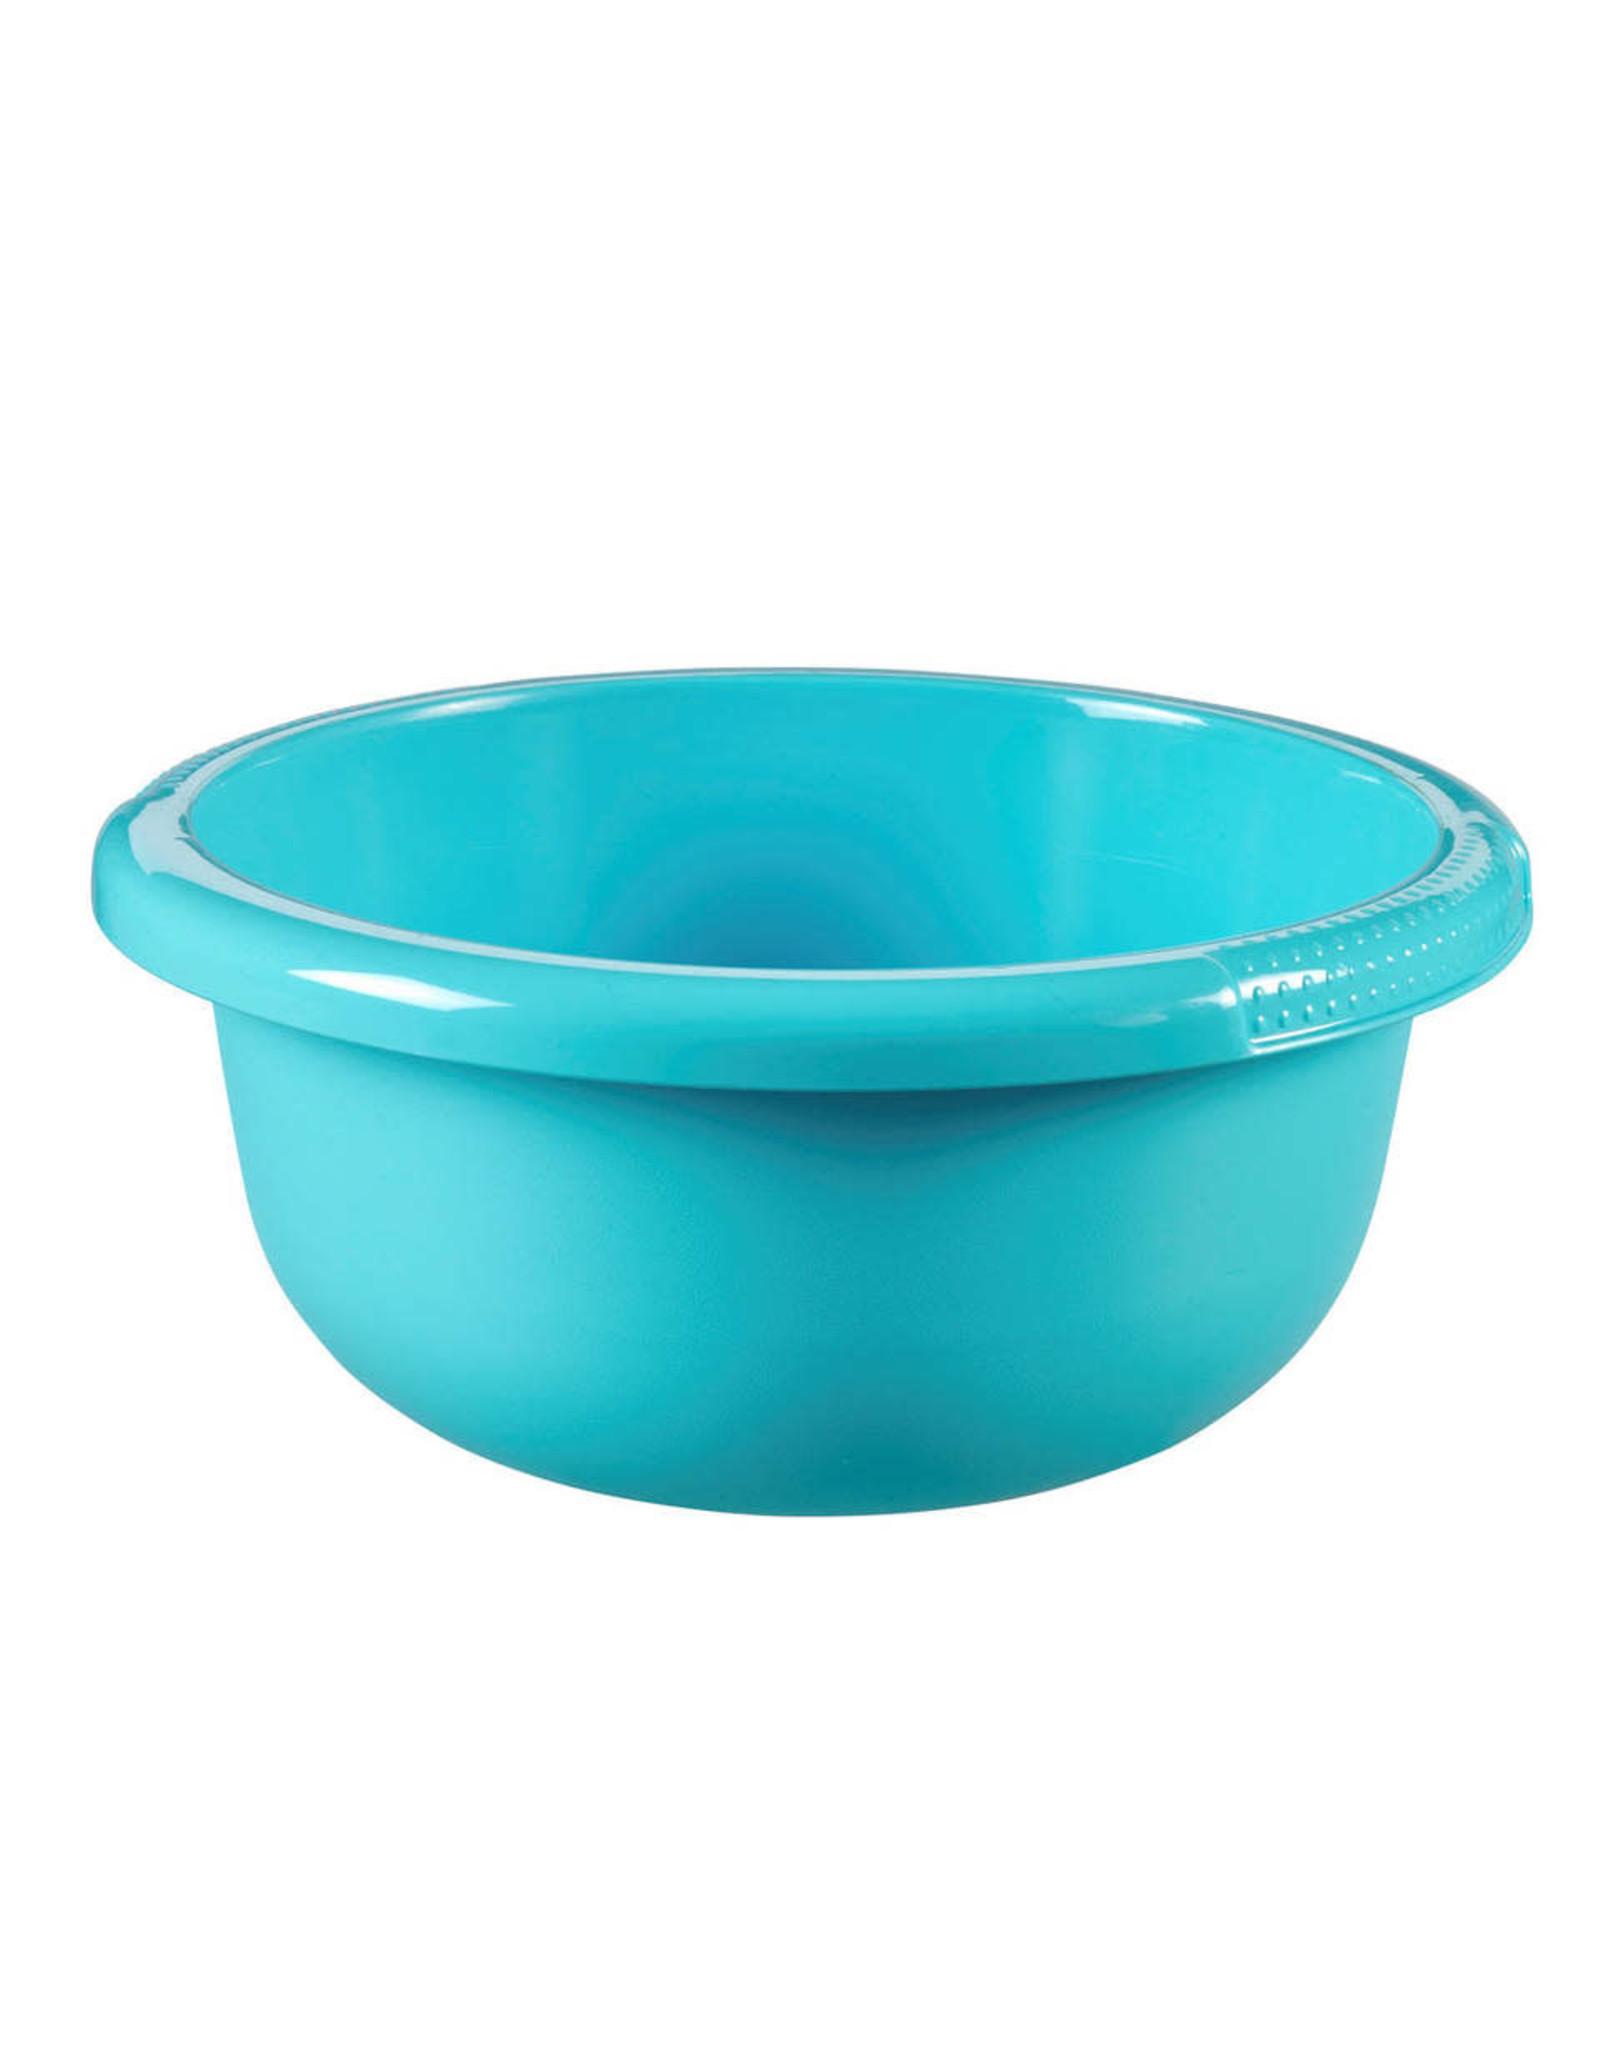 CURVER Curver afwasteil 2,5L rond molokai blauw